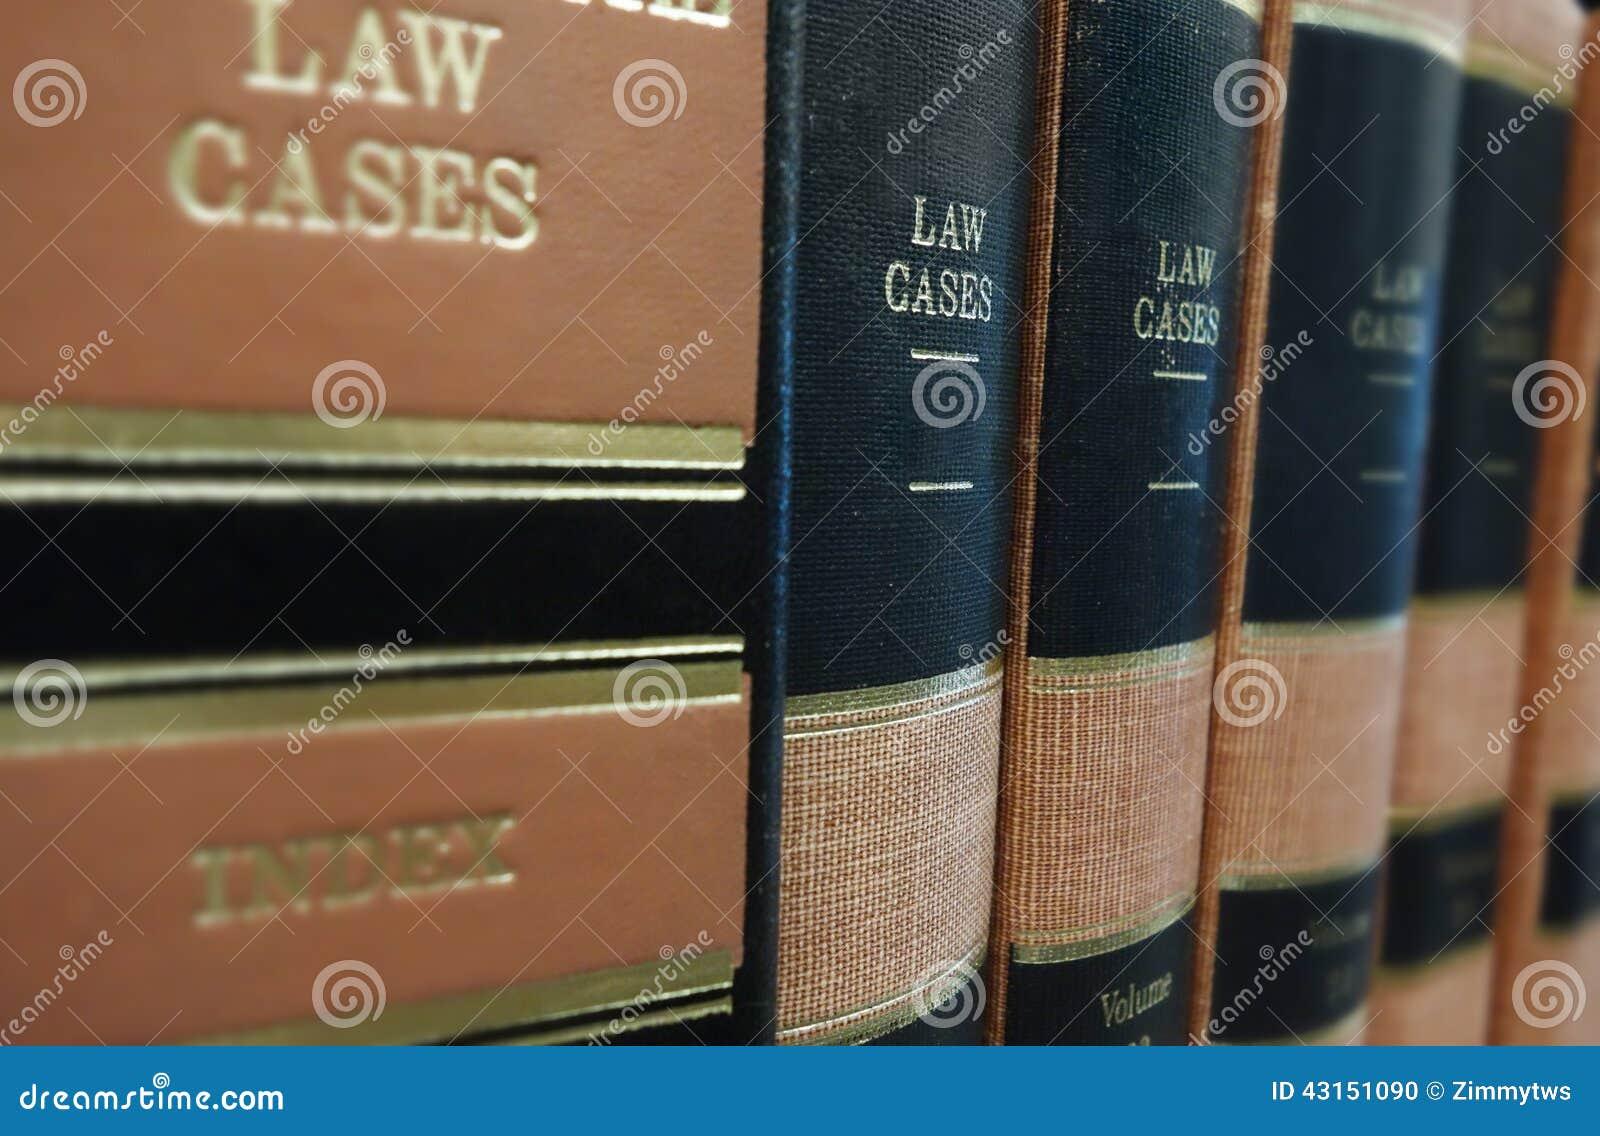 Casos juzgados